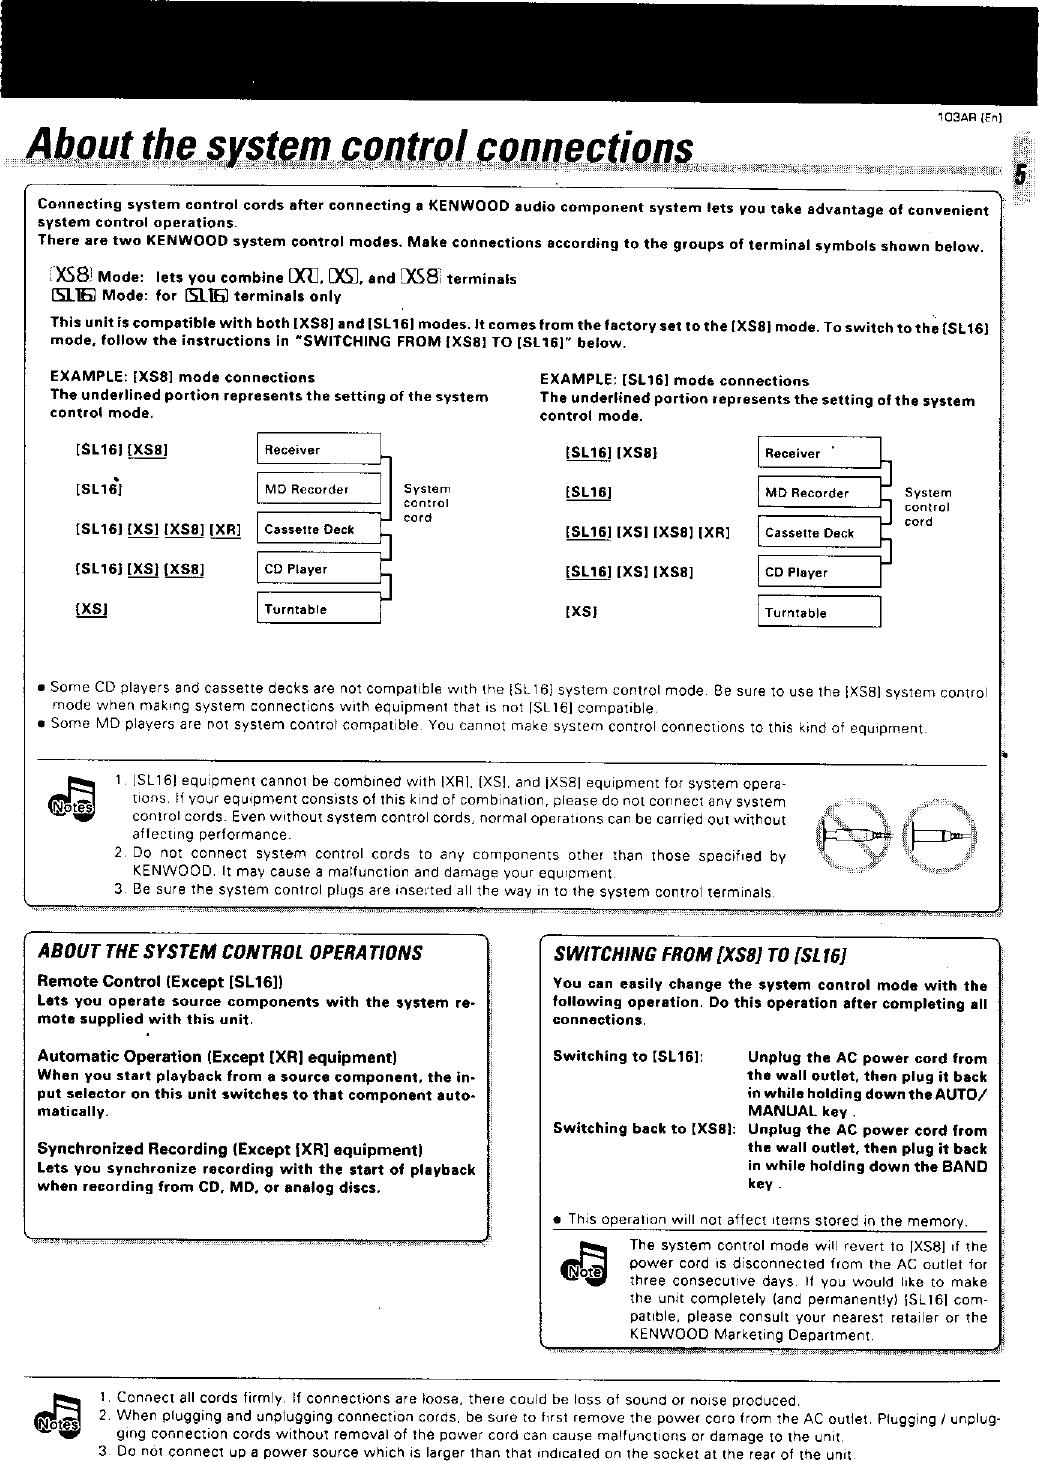 KENWOOD Receivers Manual L0070077